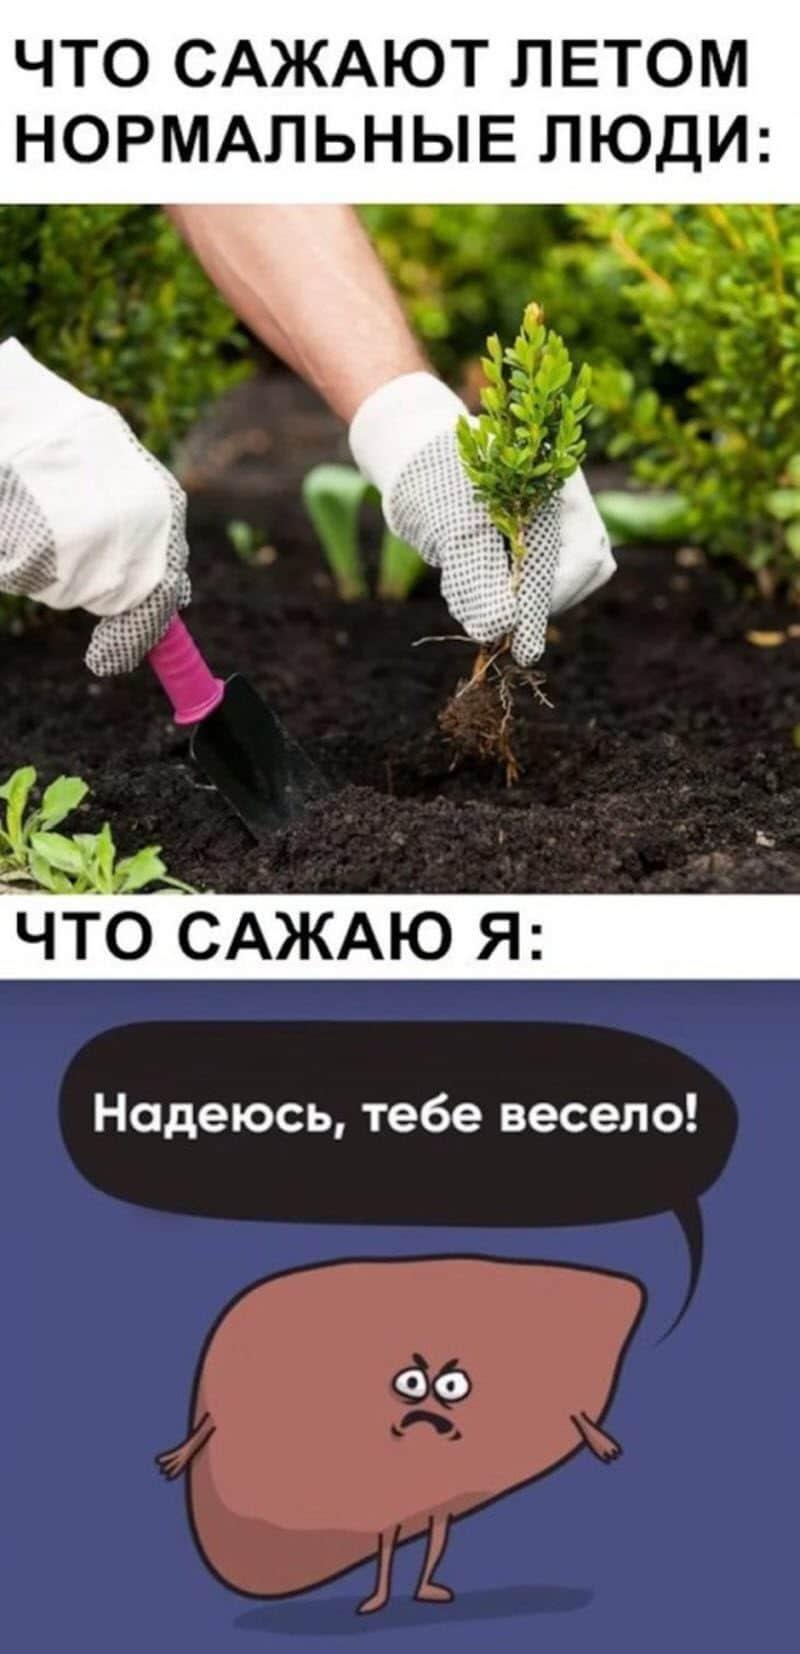 auto_07-22podborka_vecher_05_8_800x1654.jpg